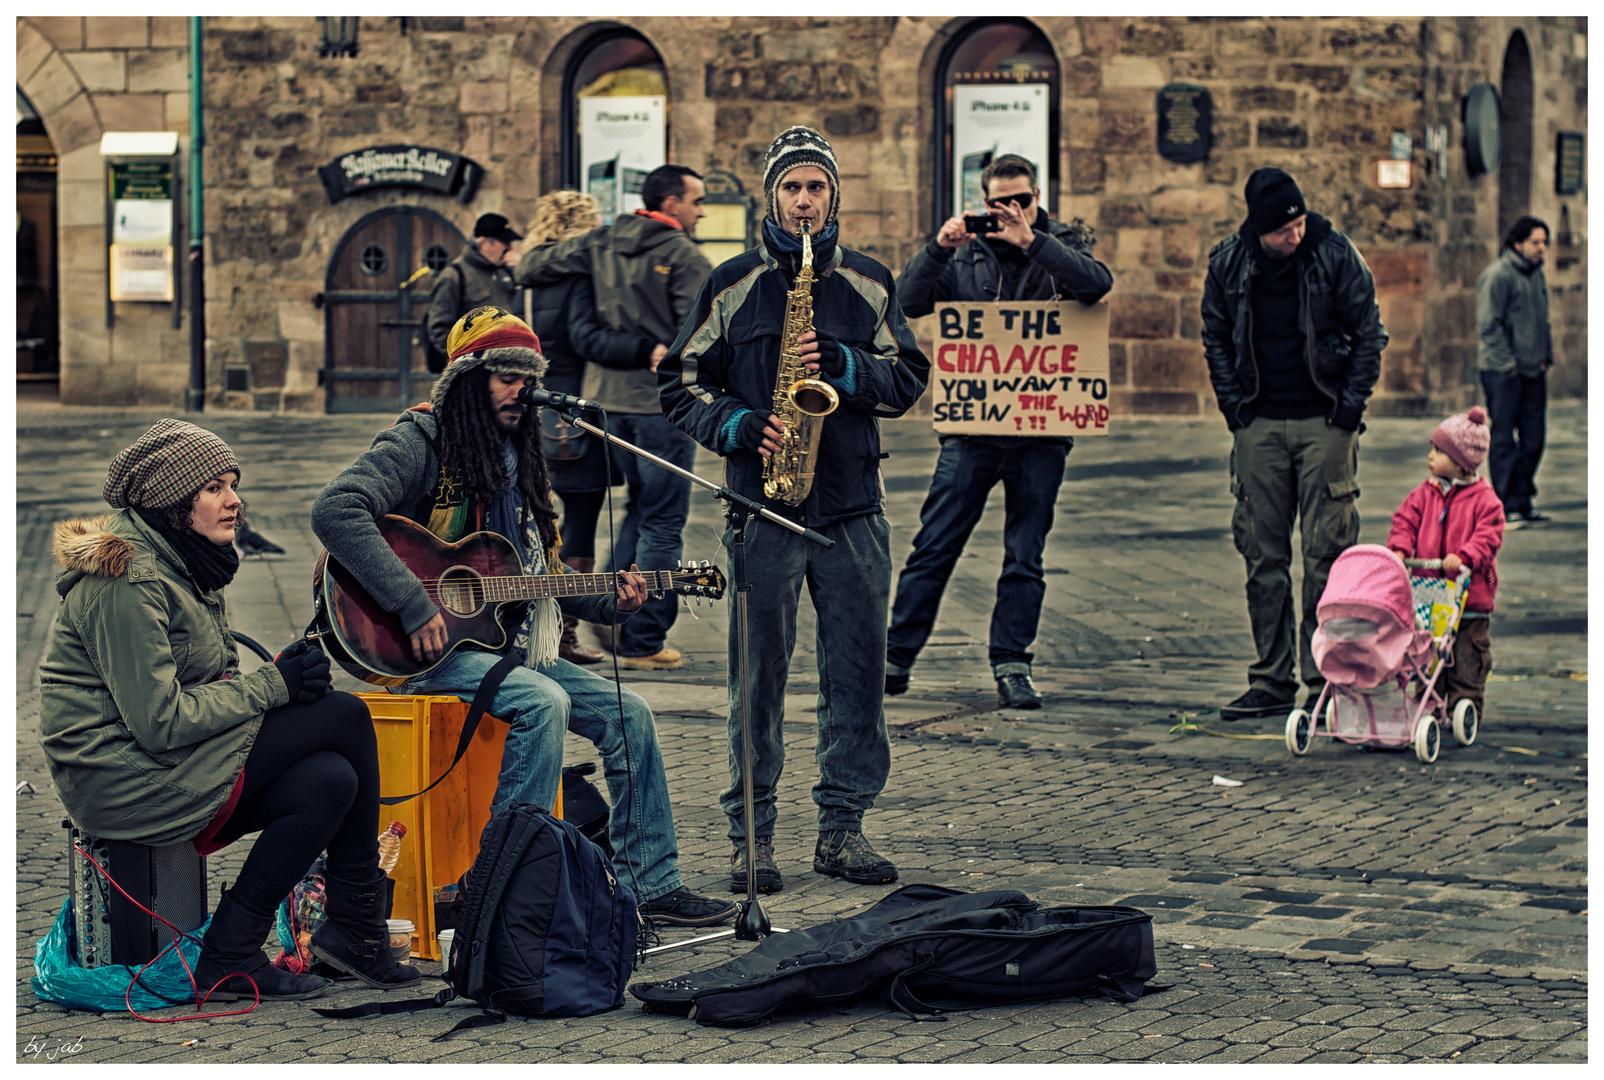 Demo in Nürnberg